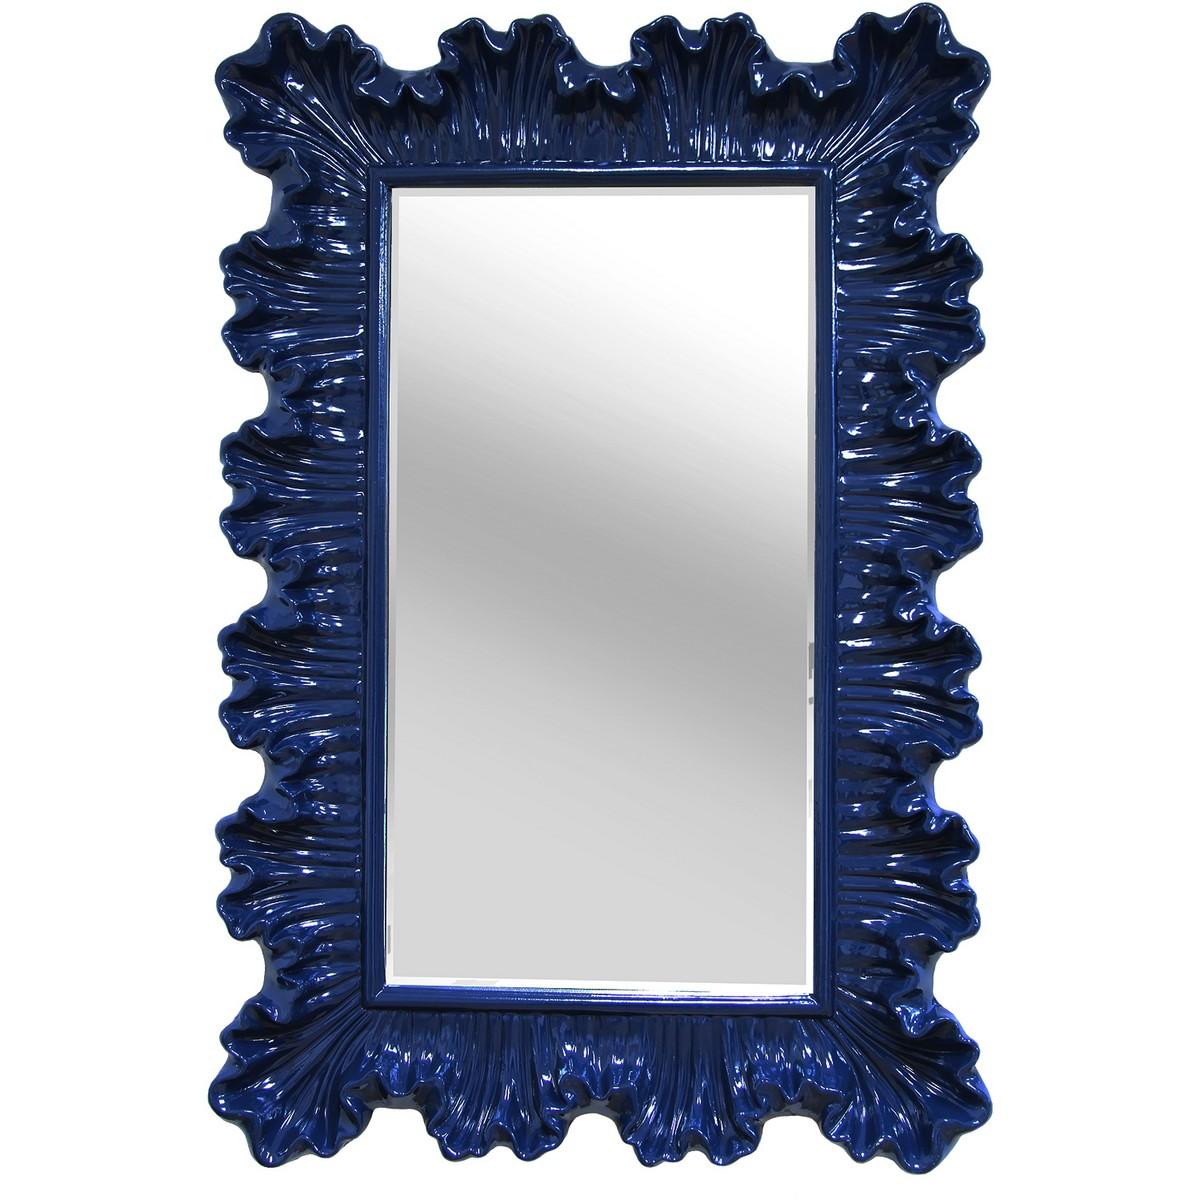 stratton home decor blue elegant ornate wall mirror navy blue